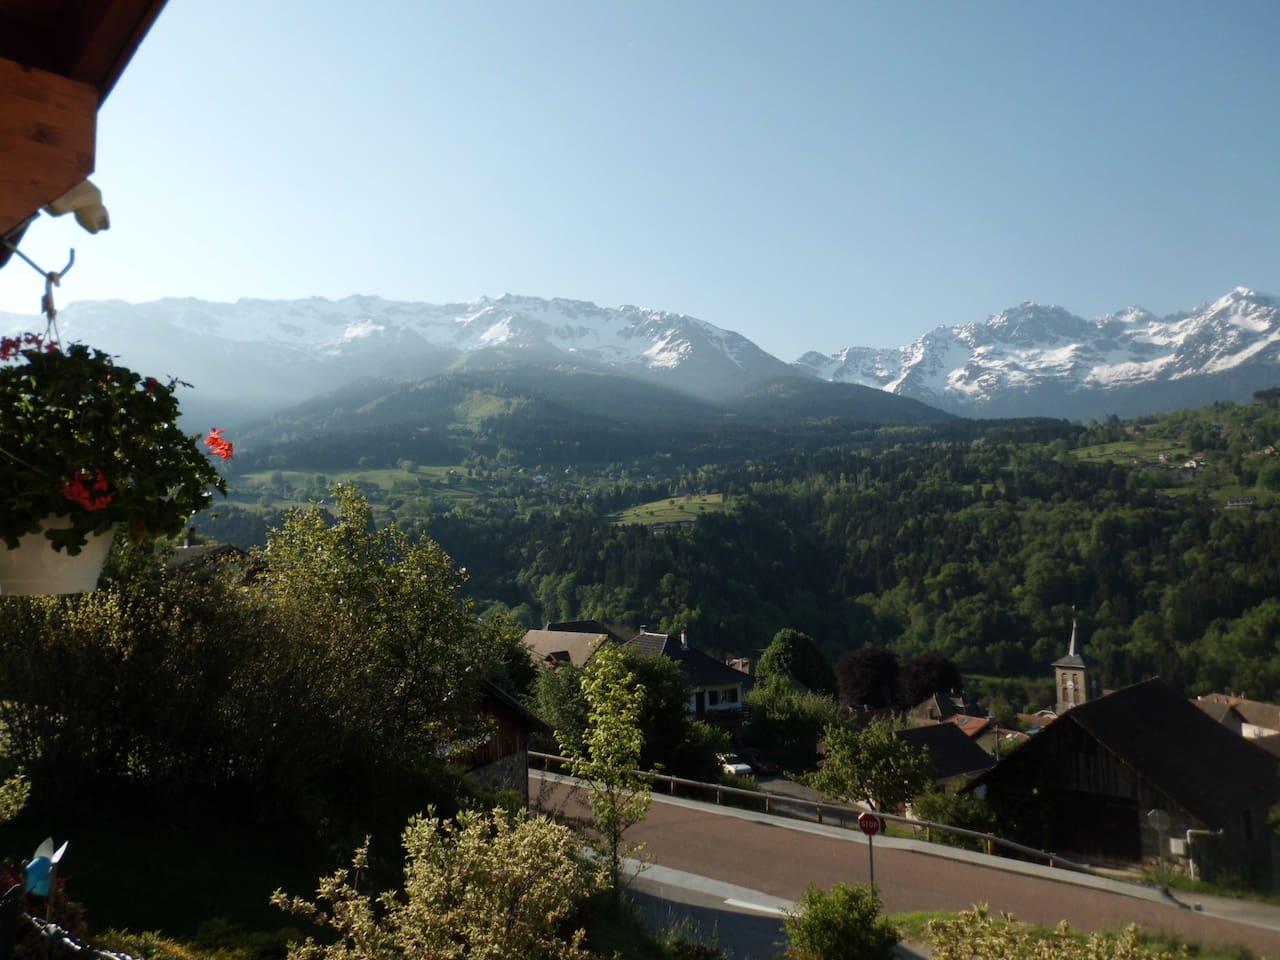 View from the veranda.